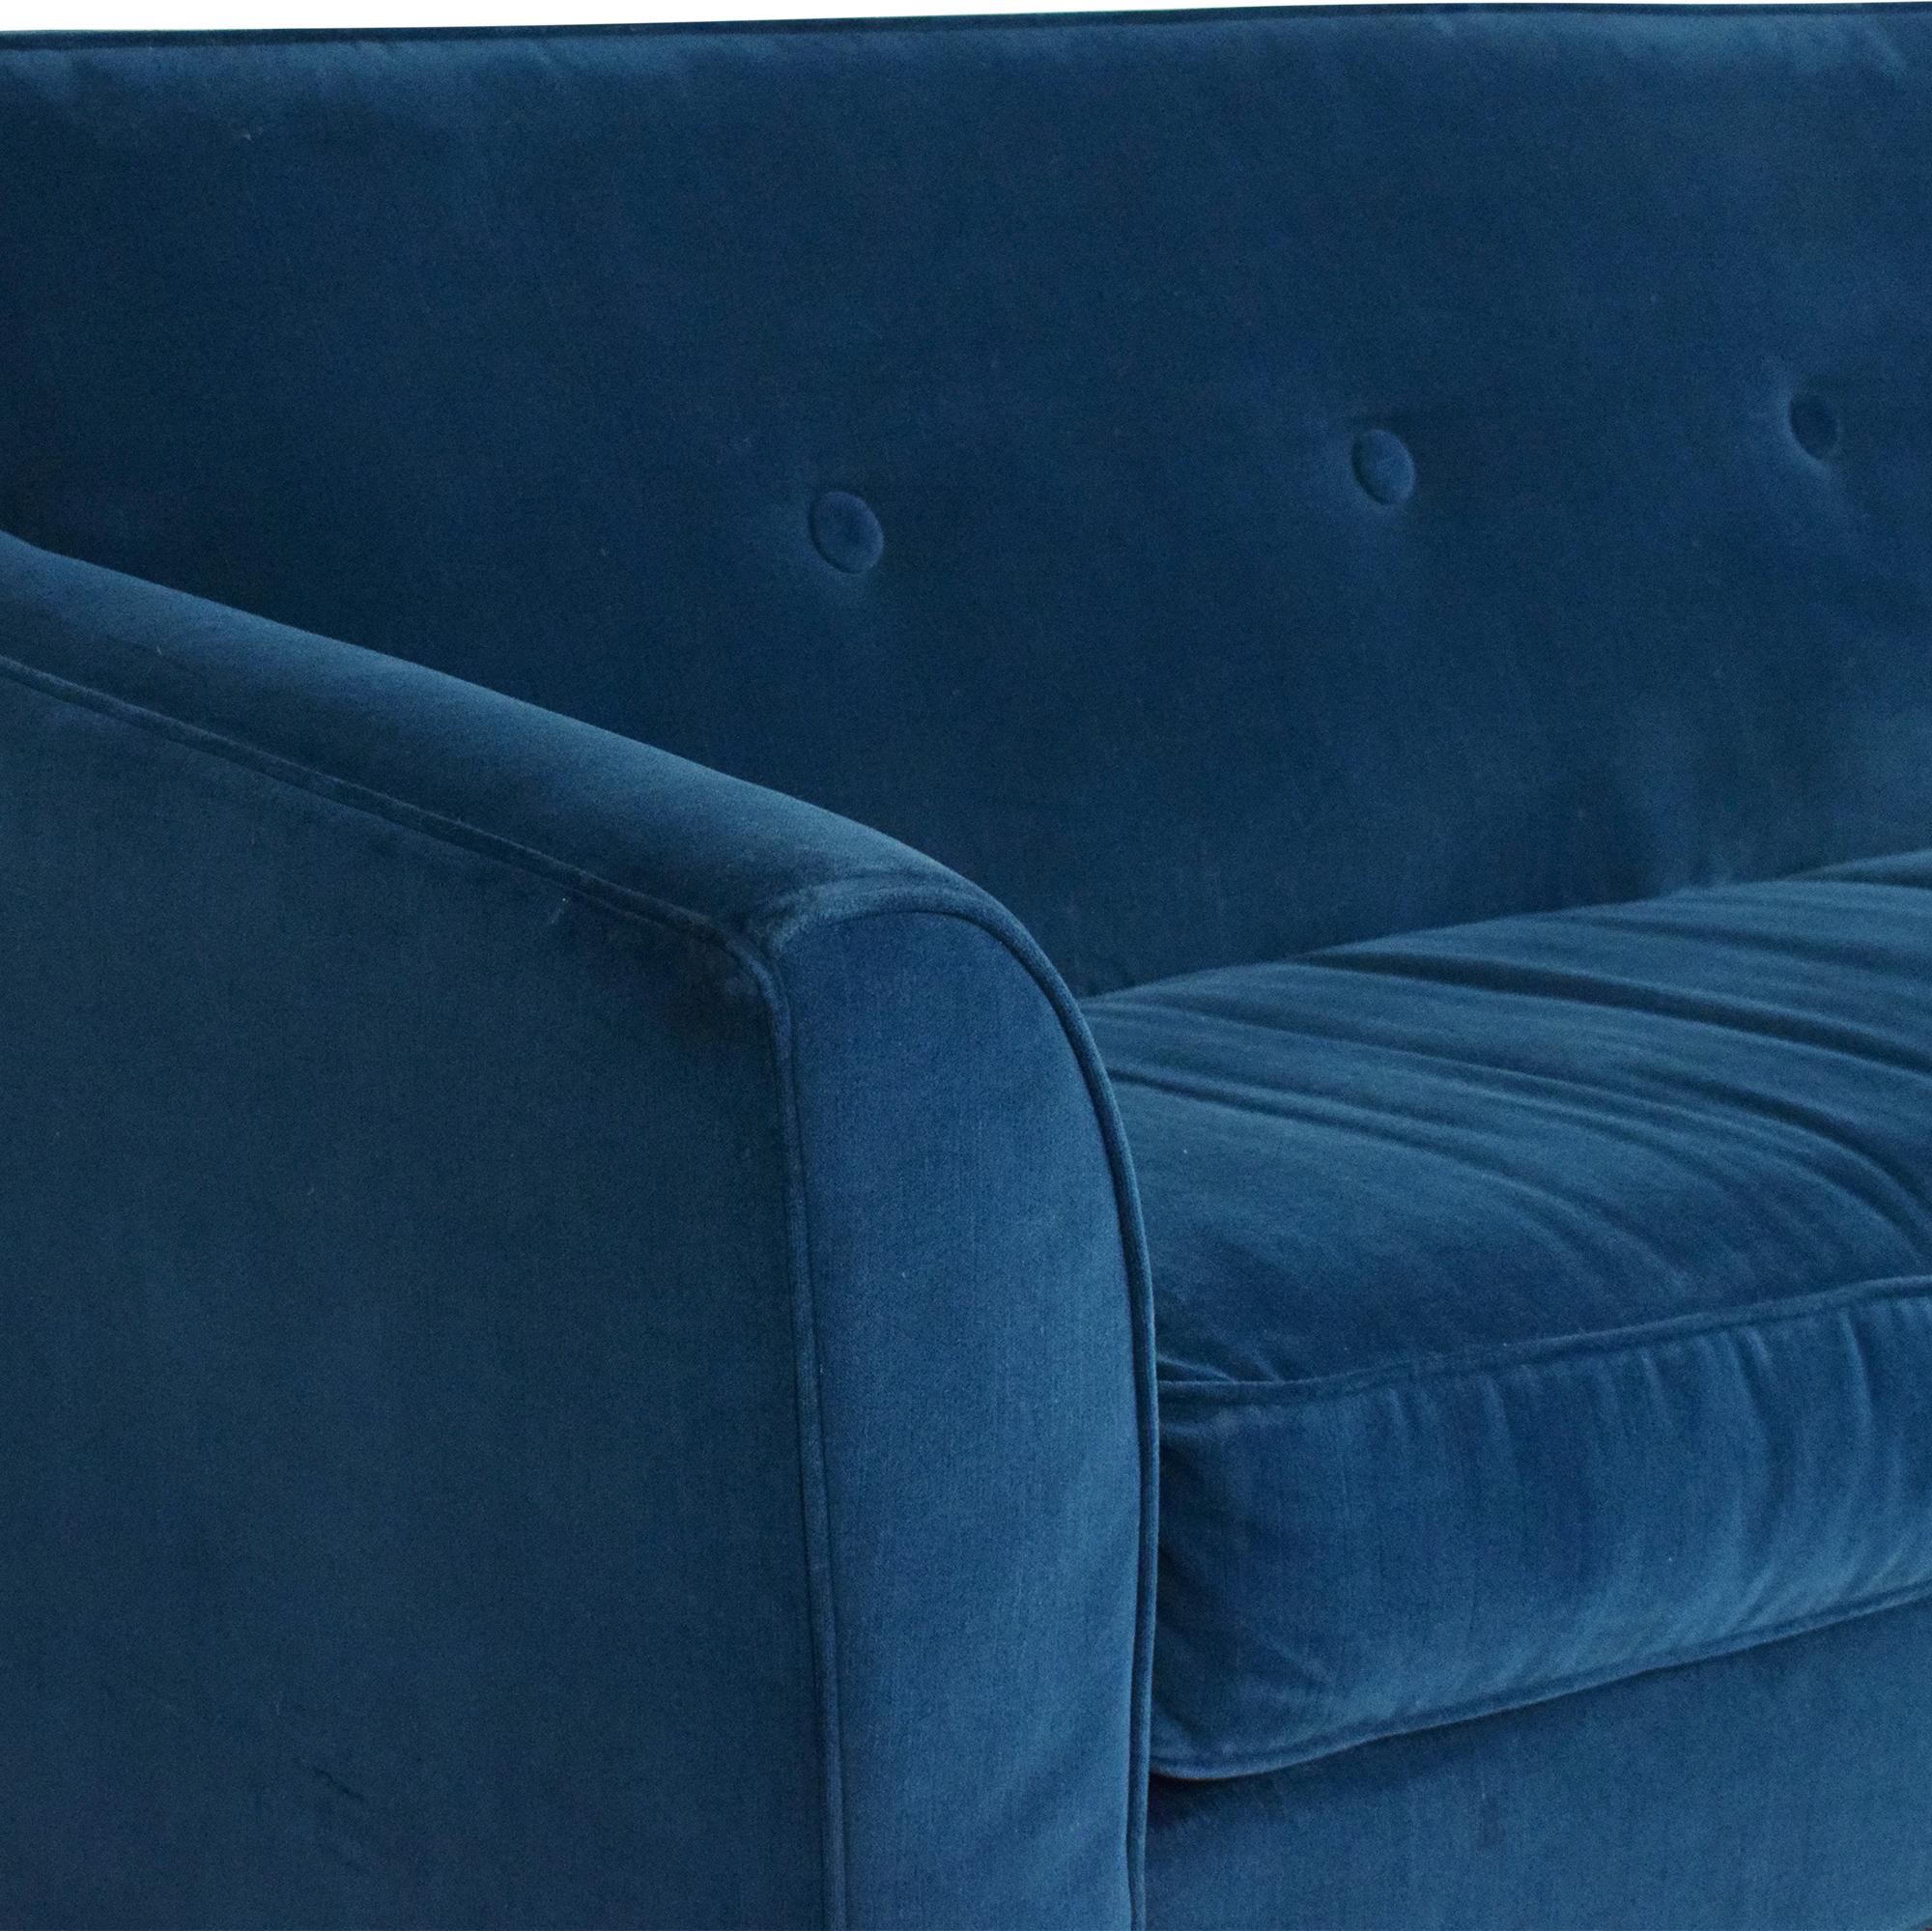 Rowe Furniture Rowe Furniture Two Cushion Sofa coupon